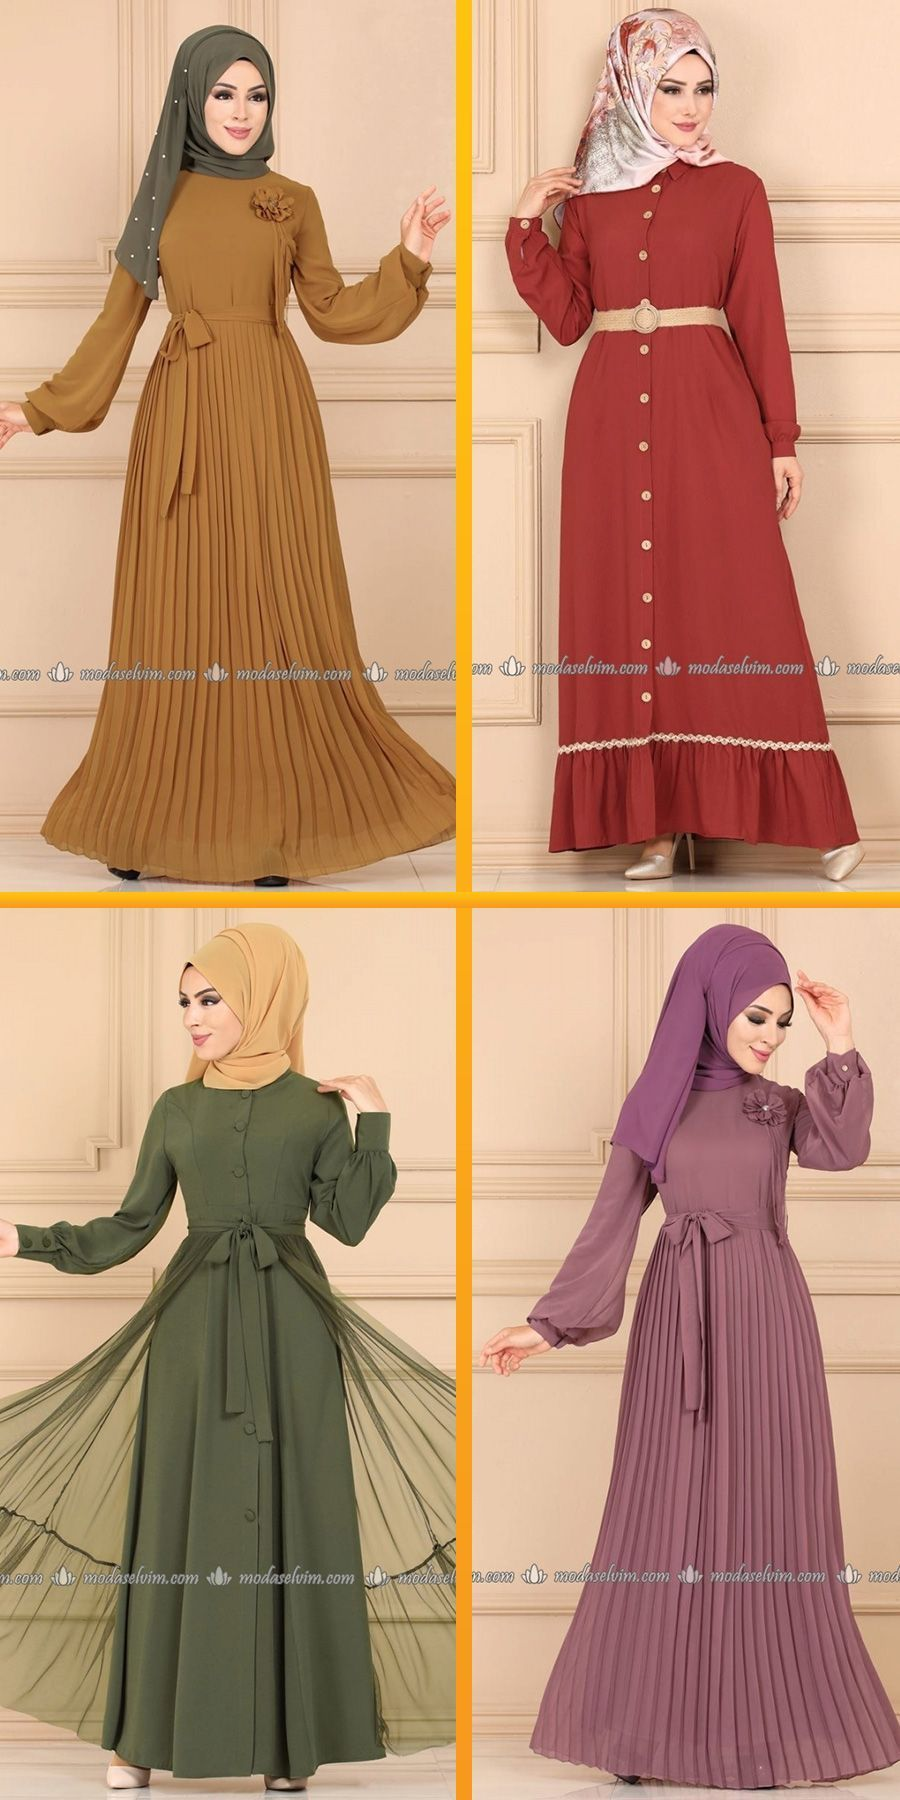 Tesettur Modasi Adli Kullanicinin Clothes And Shoes Panosundaki Pin 2020 Moda Stilleri The Dress Elbise Modelleri